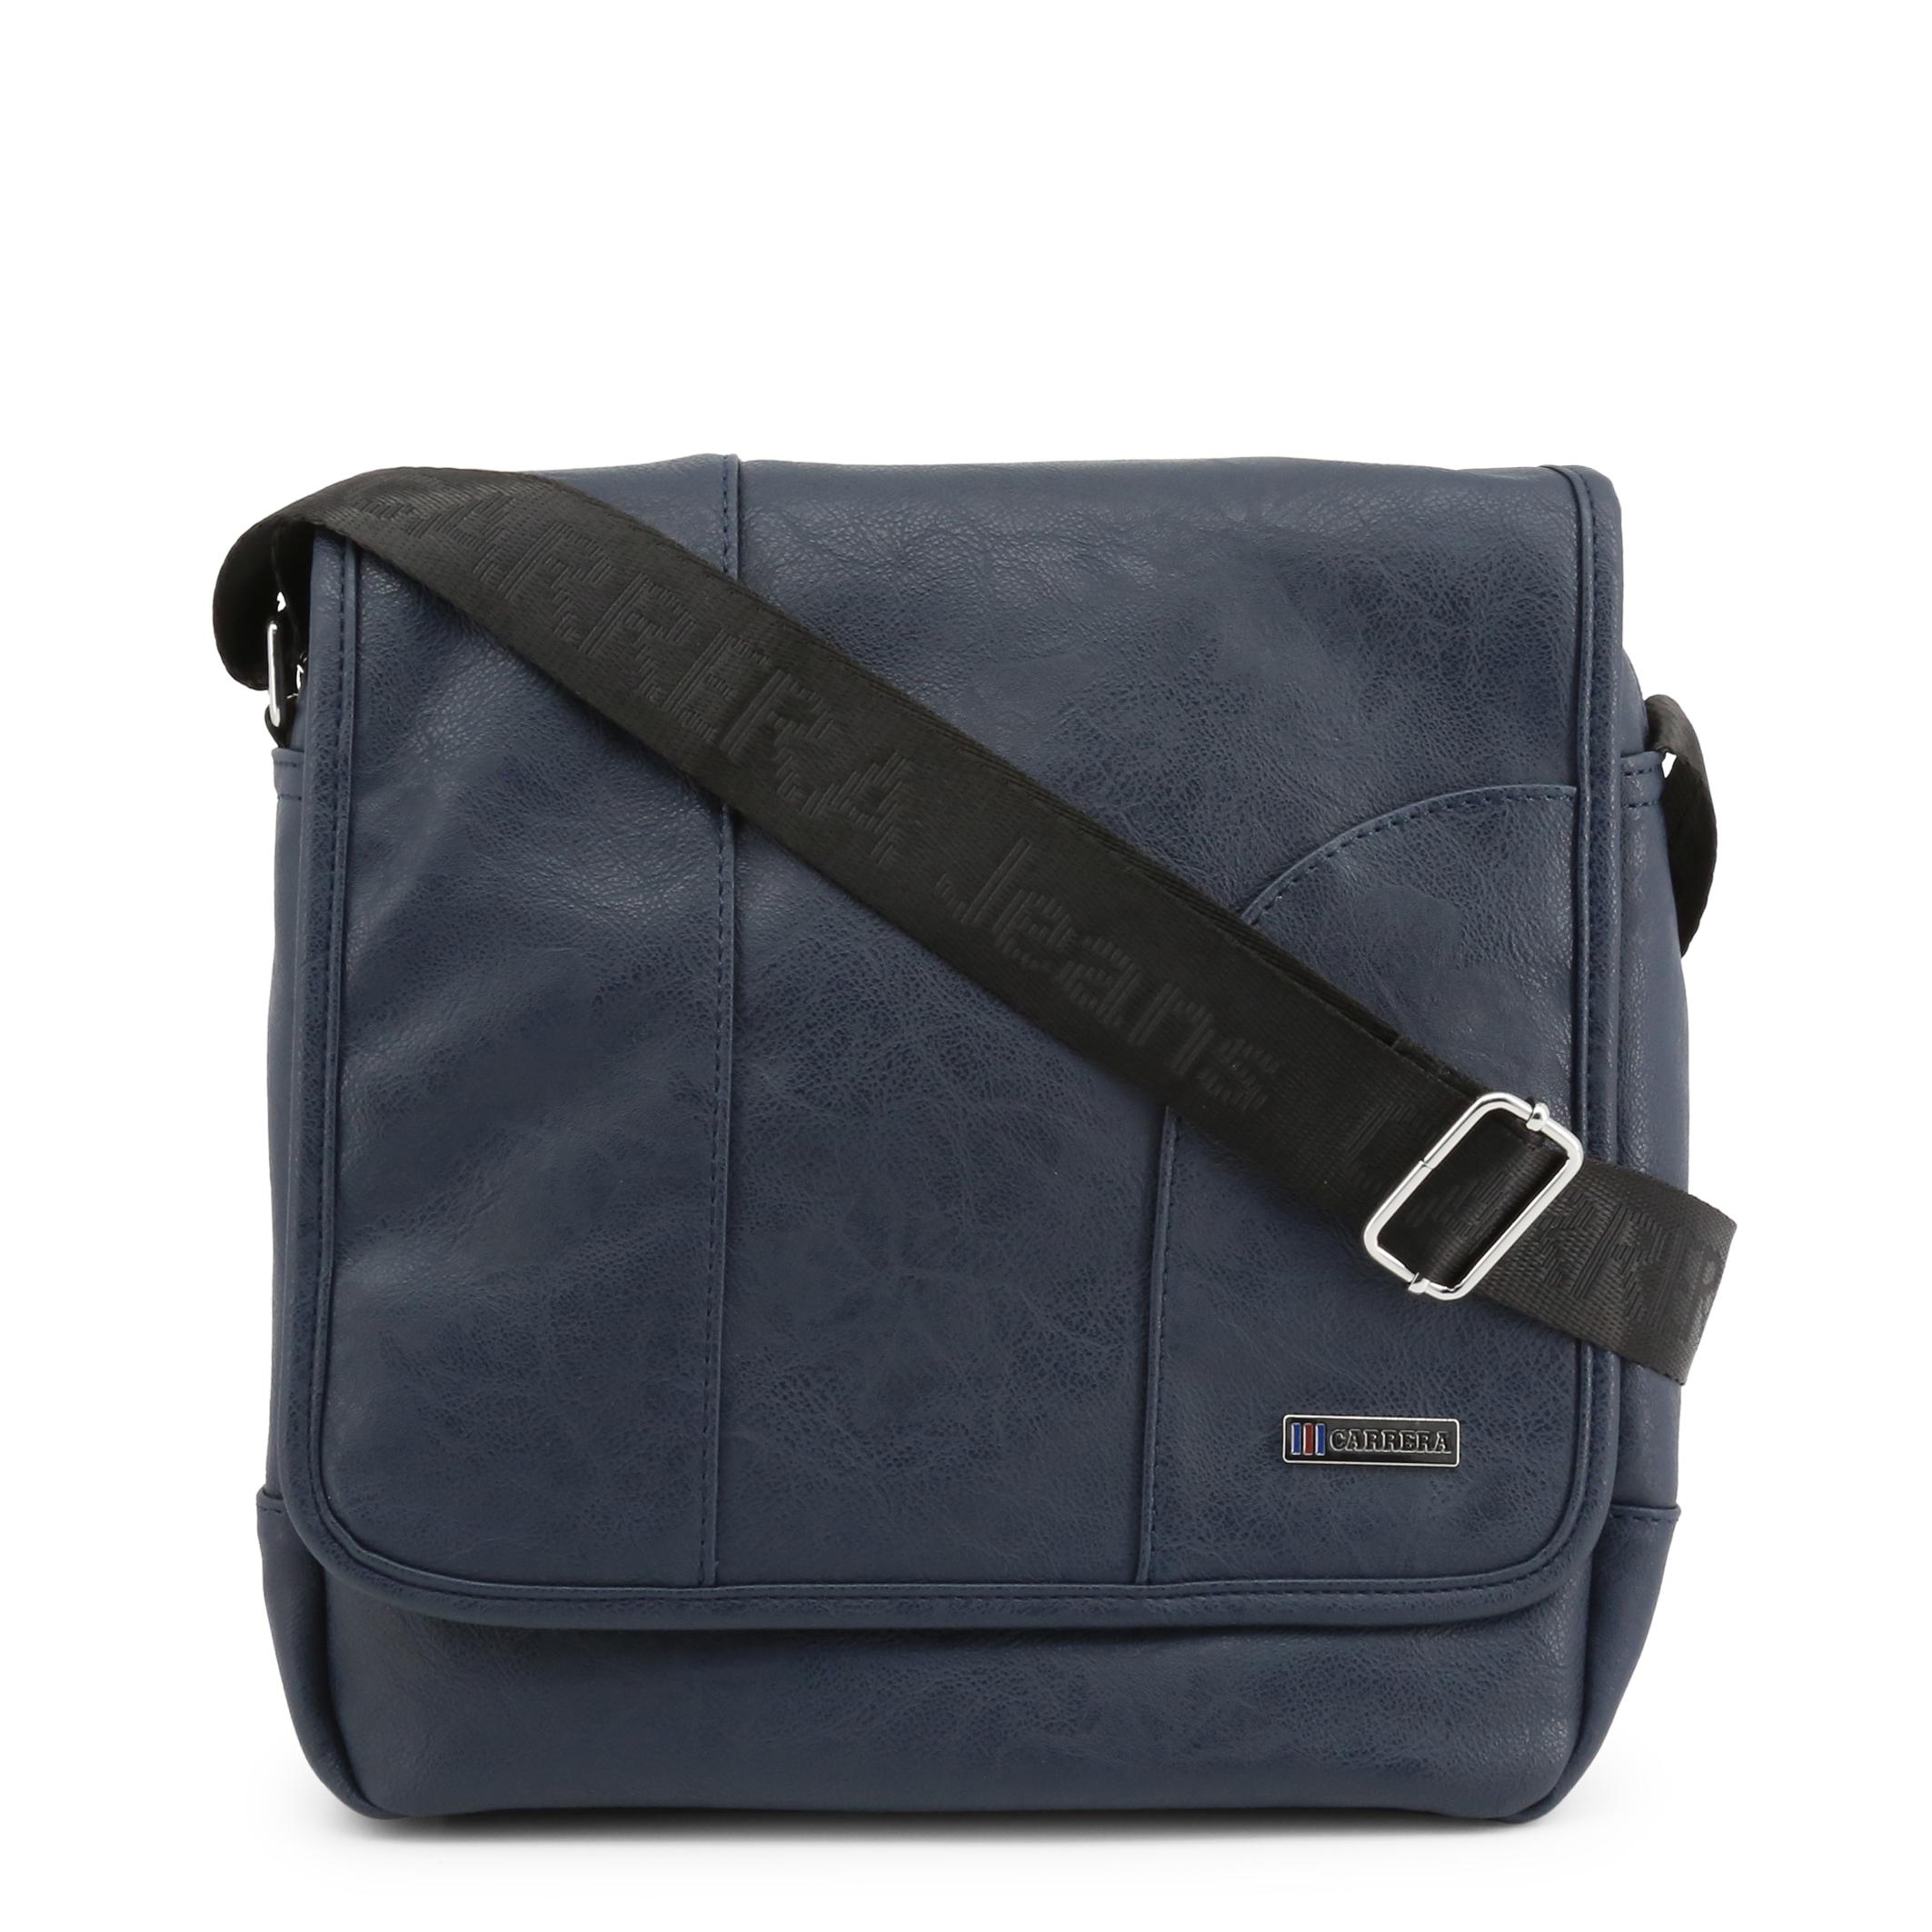 Carrera Jeans NEW-HOLD_CB1503_DK BLUE